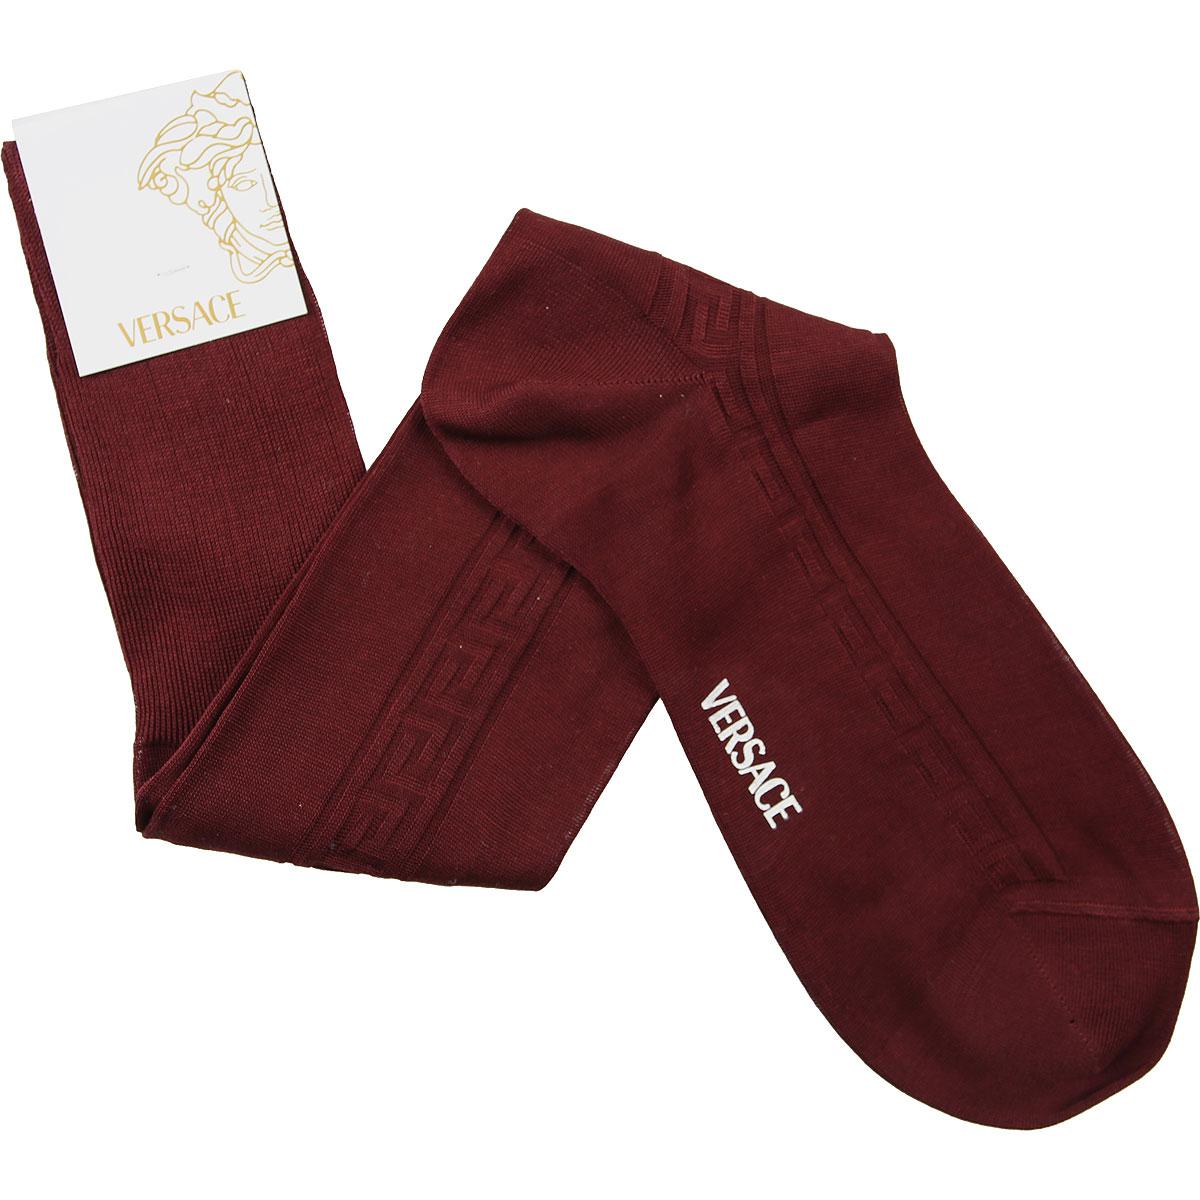 Versace Socks Socks for Men On Sale in Outlet, Bordeaux, Lisle Cotton Thread, 2019, 11 (Shoe Size: EU 43 - US 9) 11.5 (Shoe Size: EU 43.5 - US 9.5)